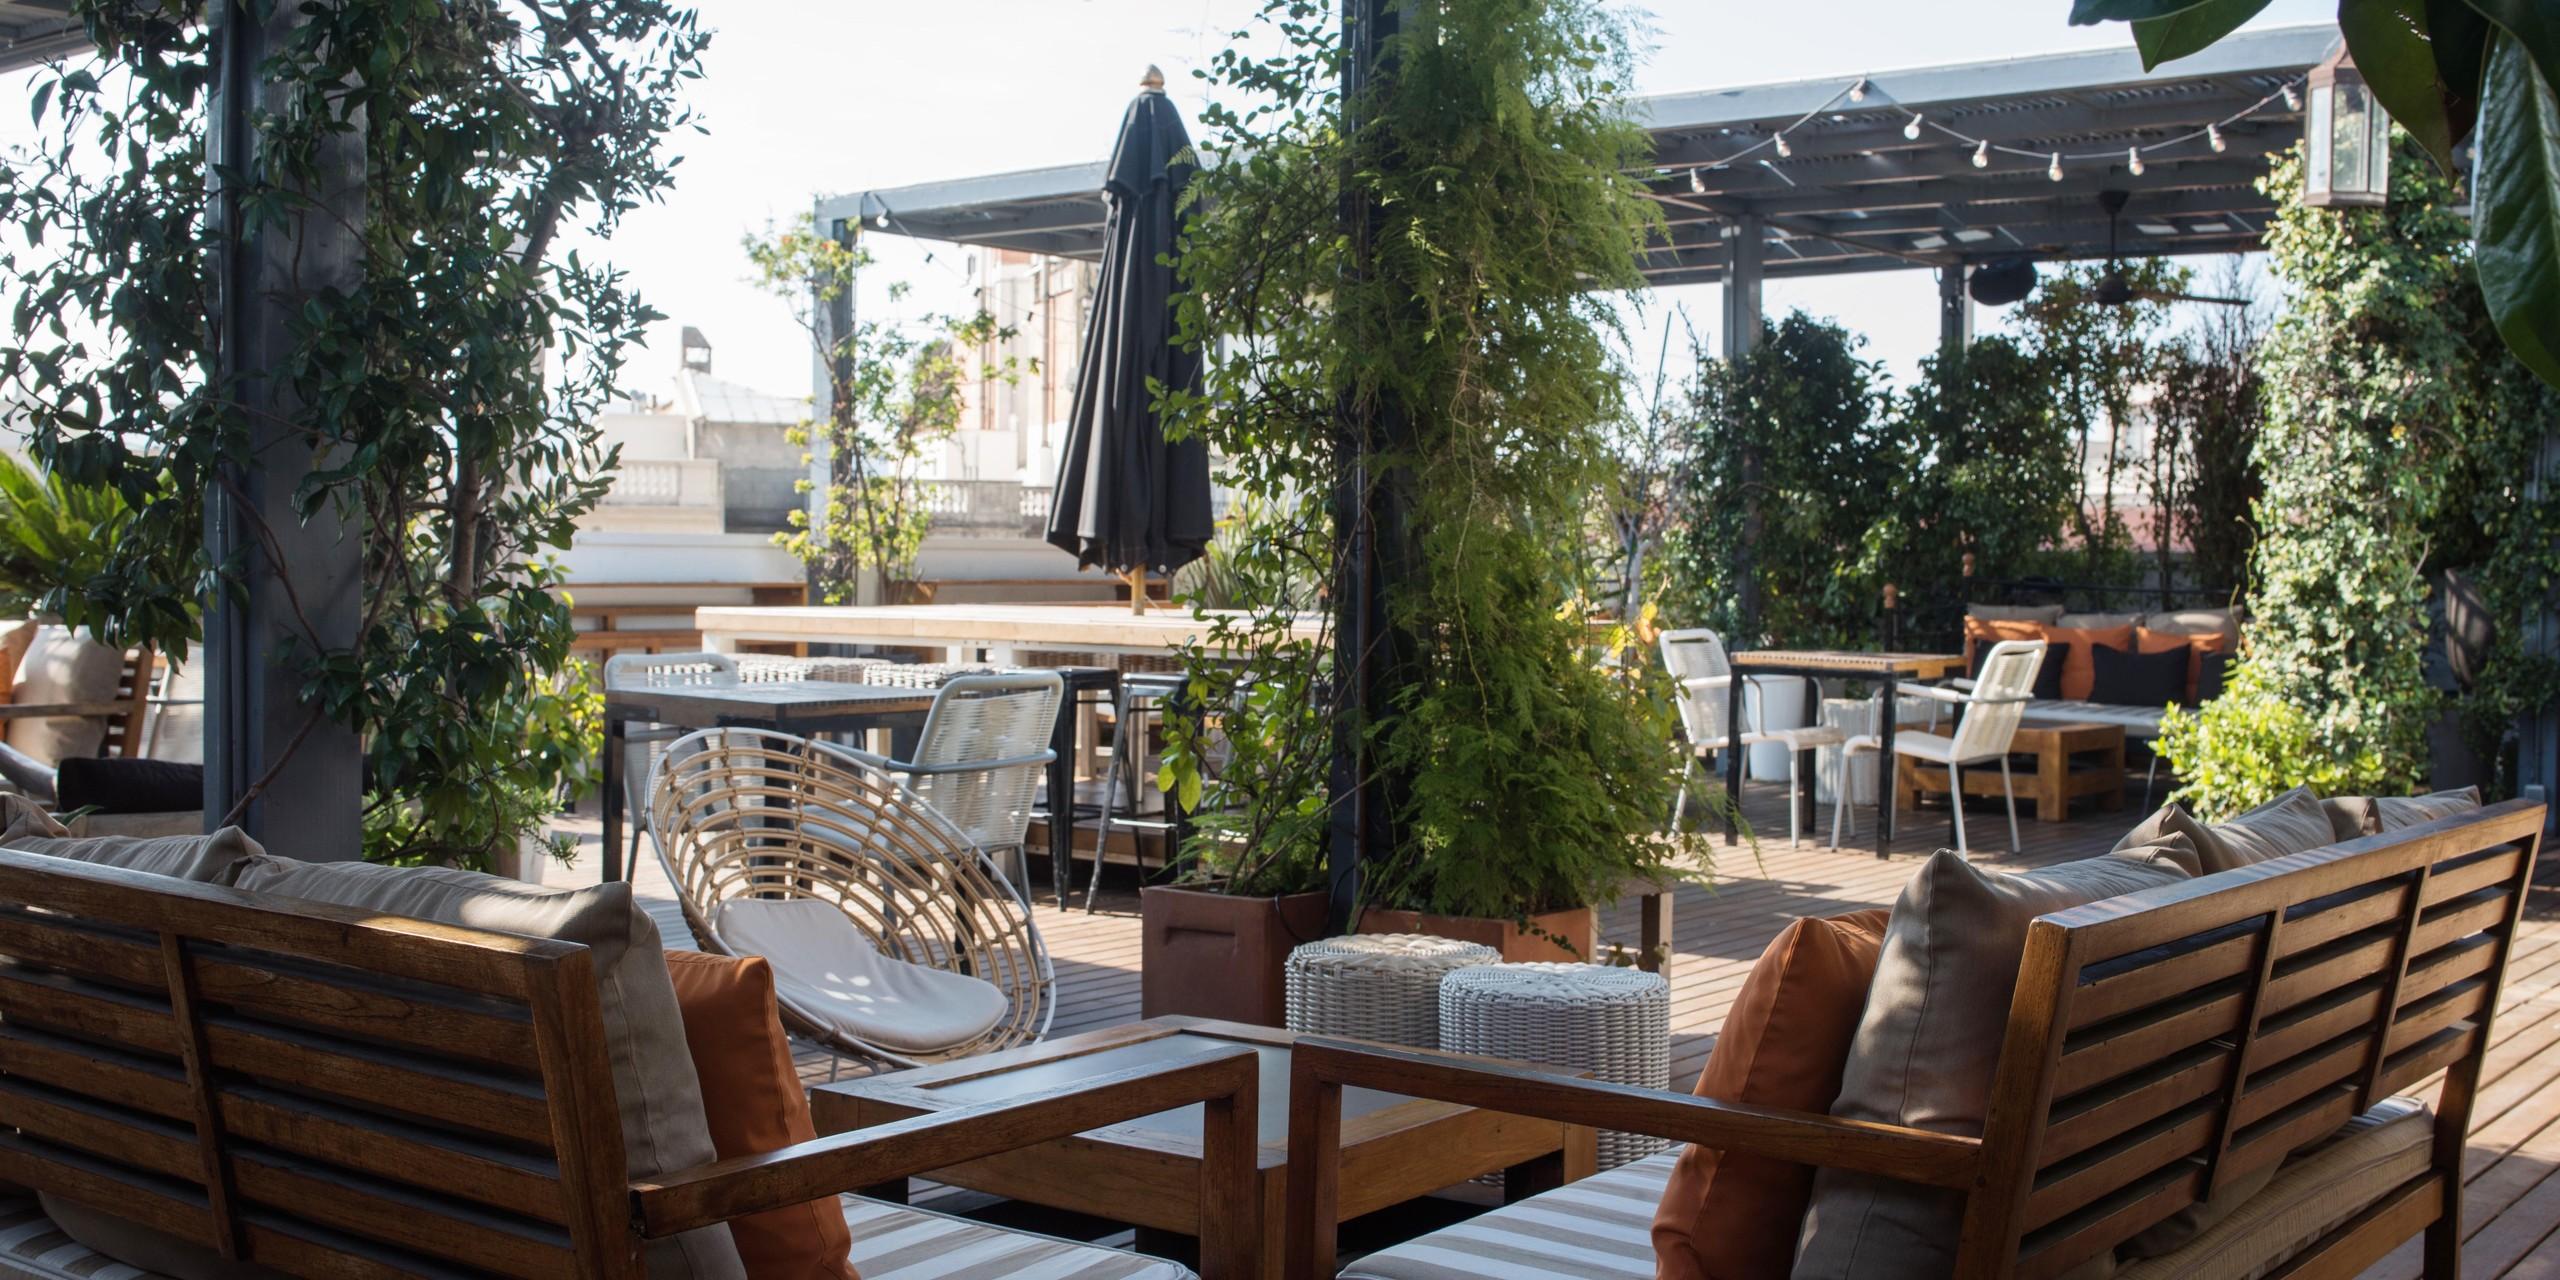 Hotel Pulitzer Terrace Barcelona Barcelona Connect